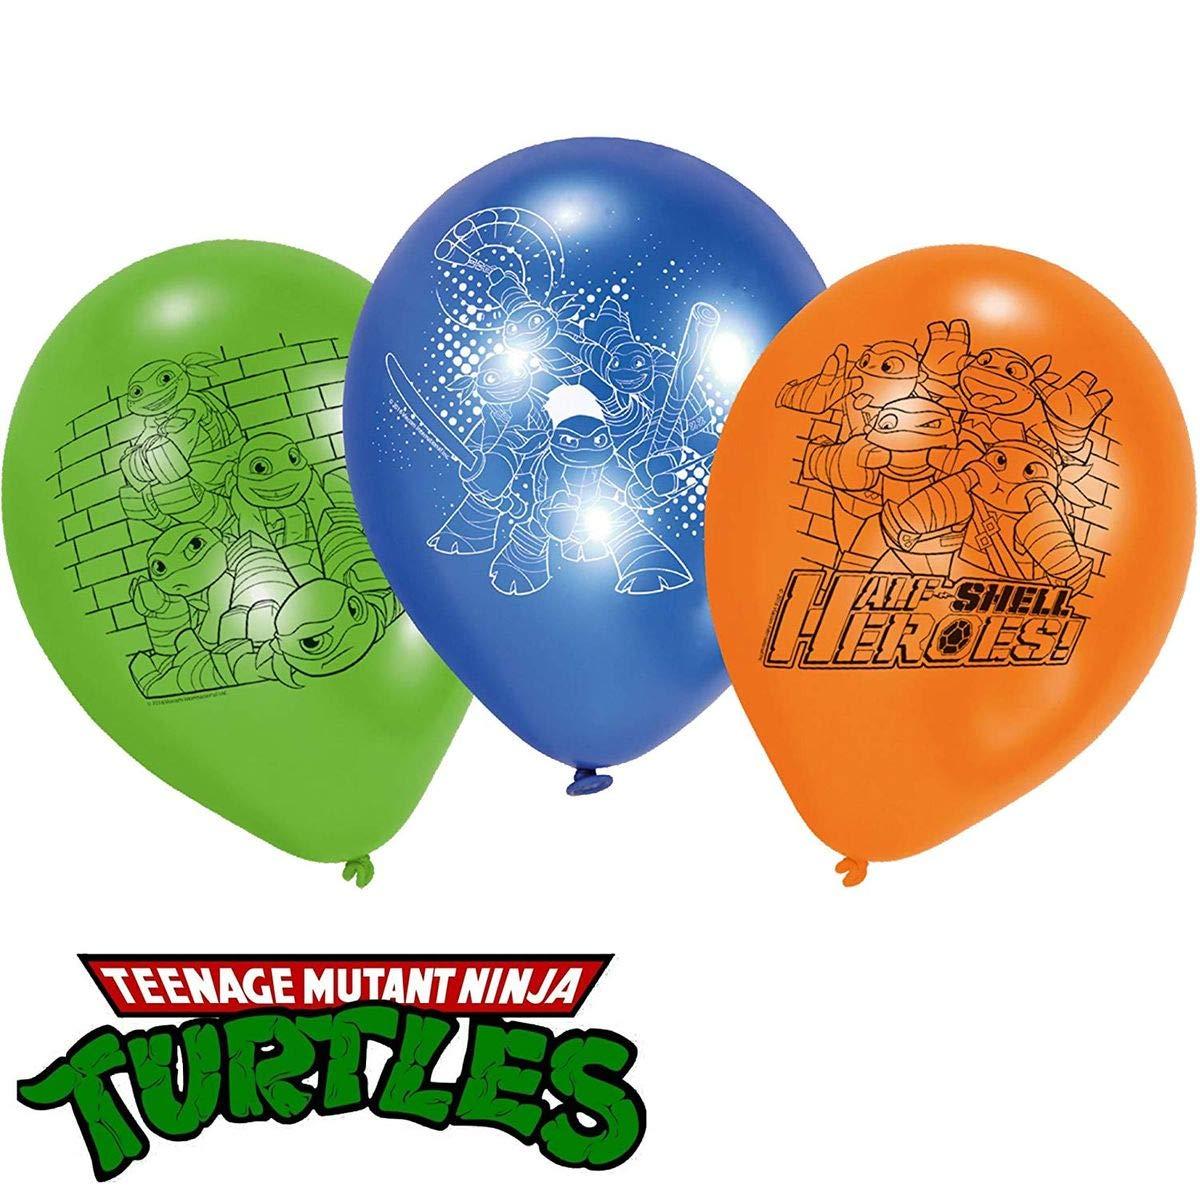 6 Globos de látex * Teenage Mutant Ninja Turtles * como ...